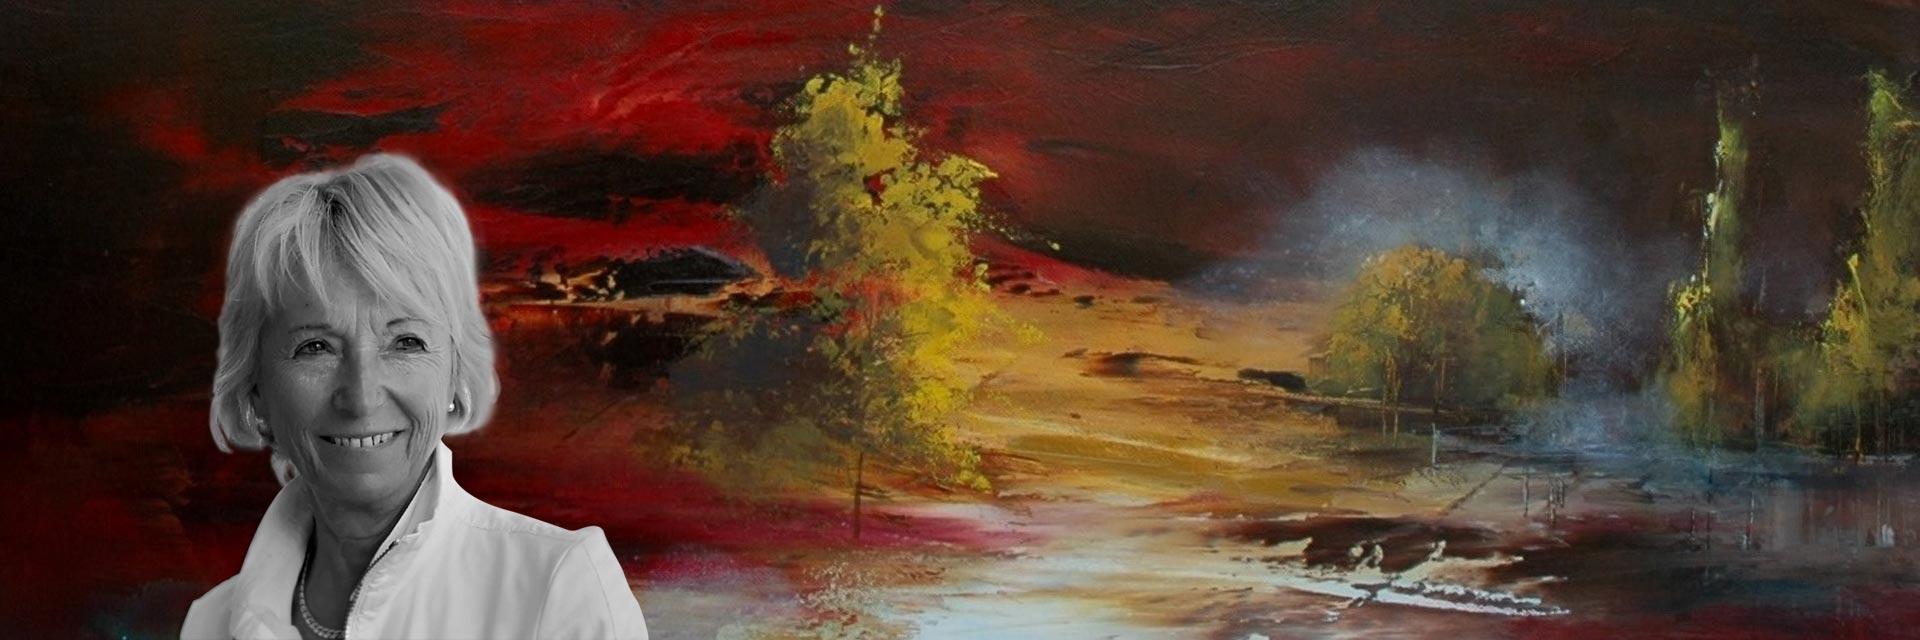 Rose Dalban artiste peintre